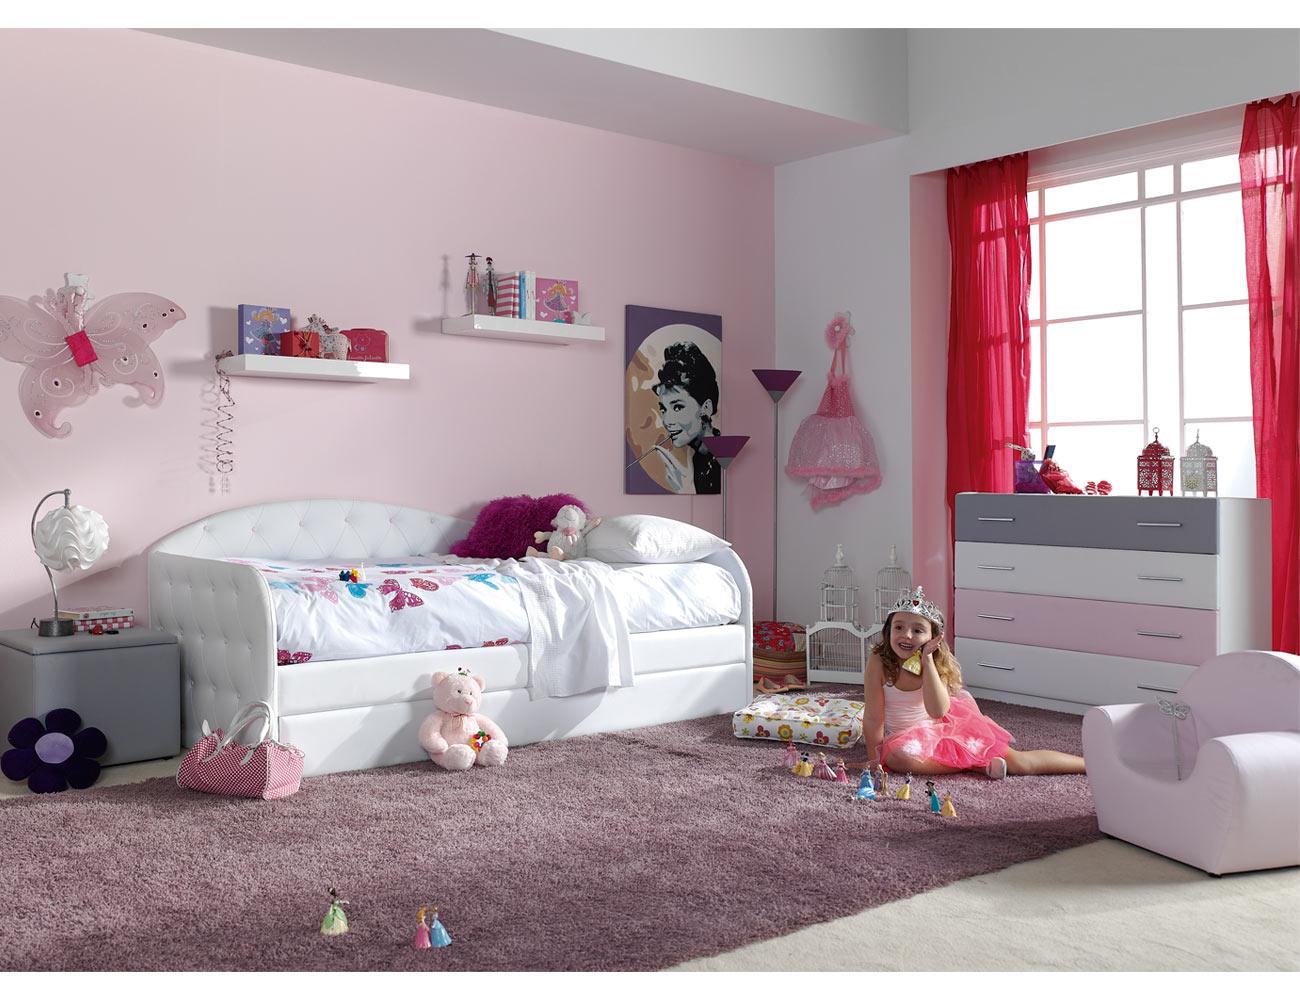 243 cama nido23